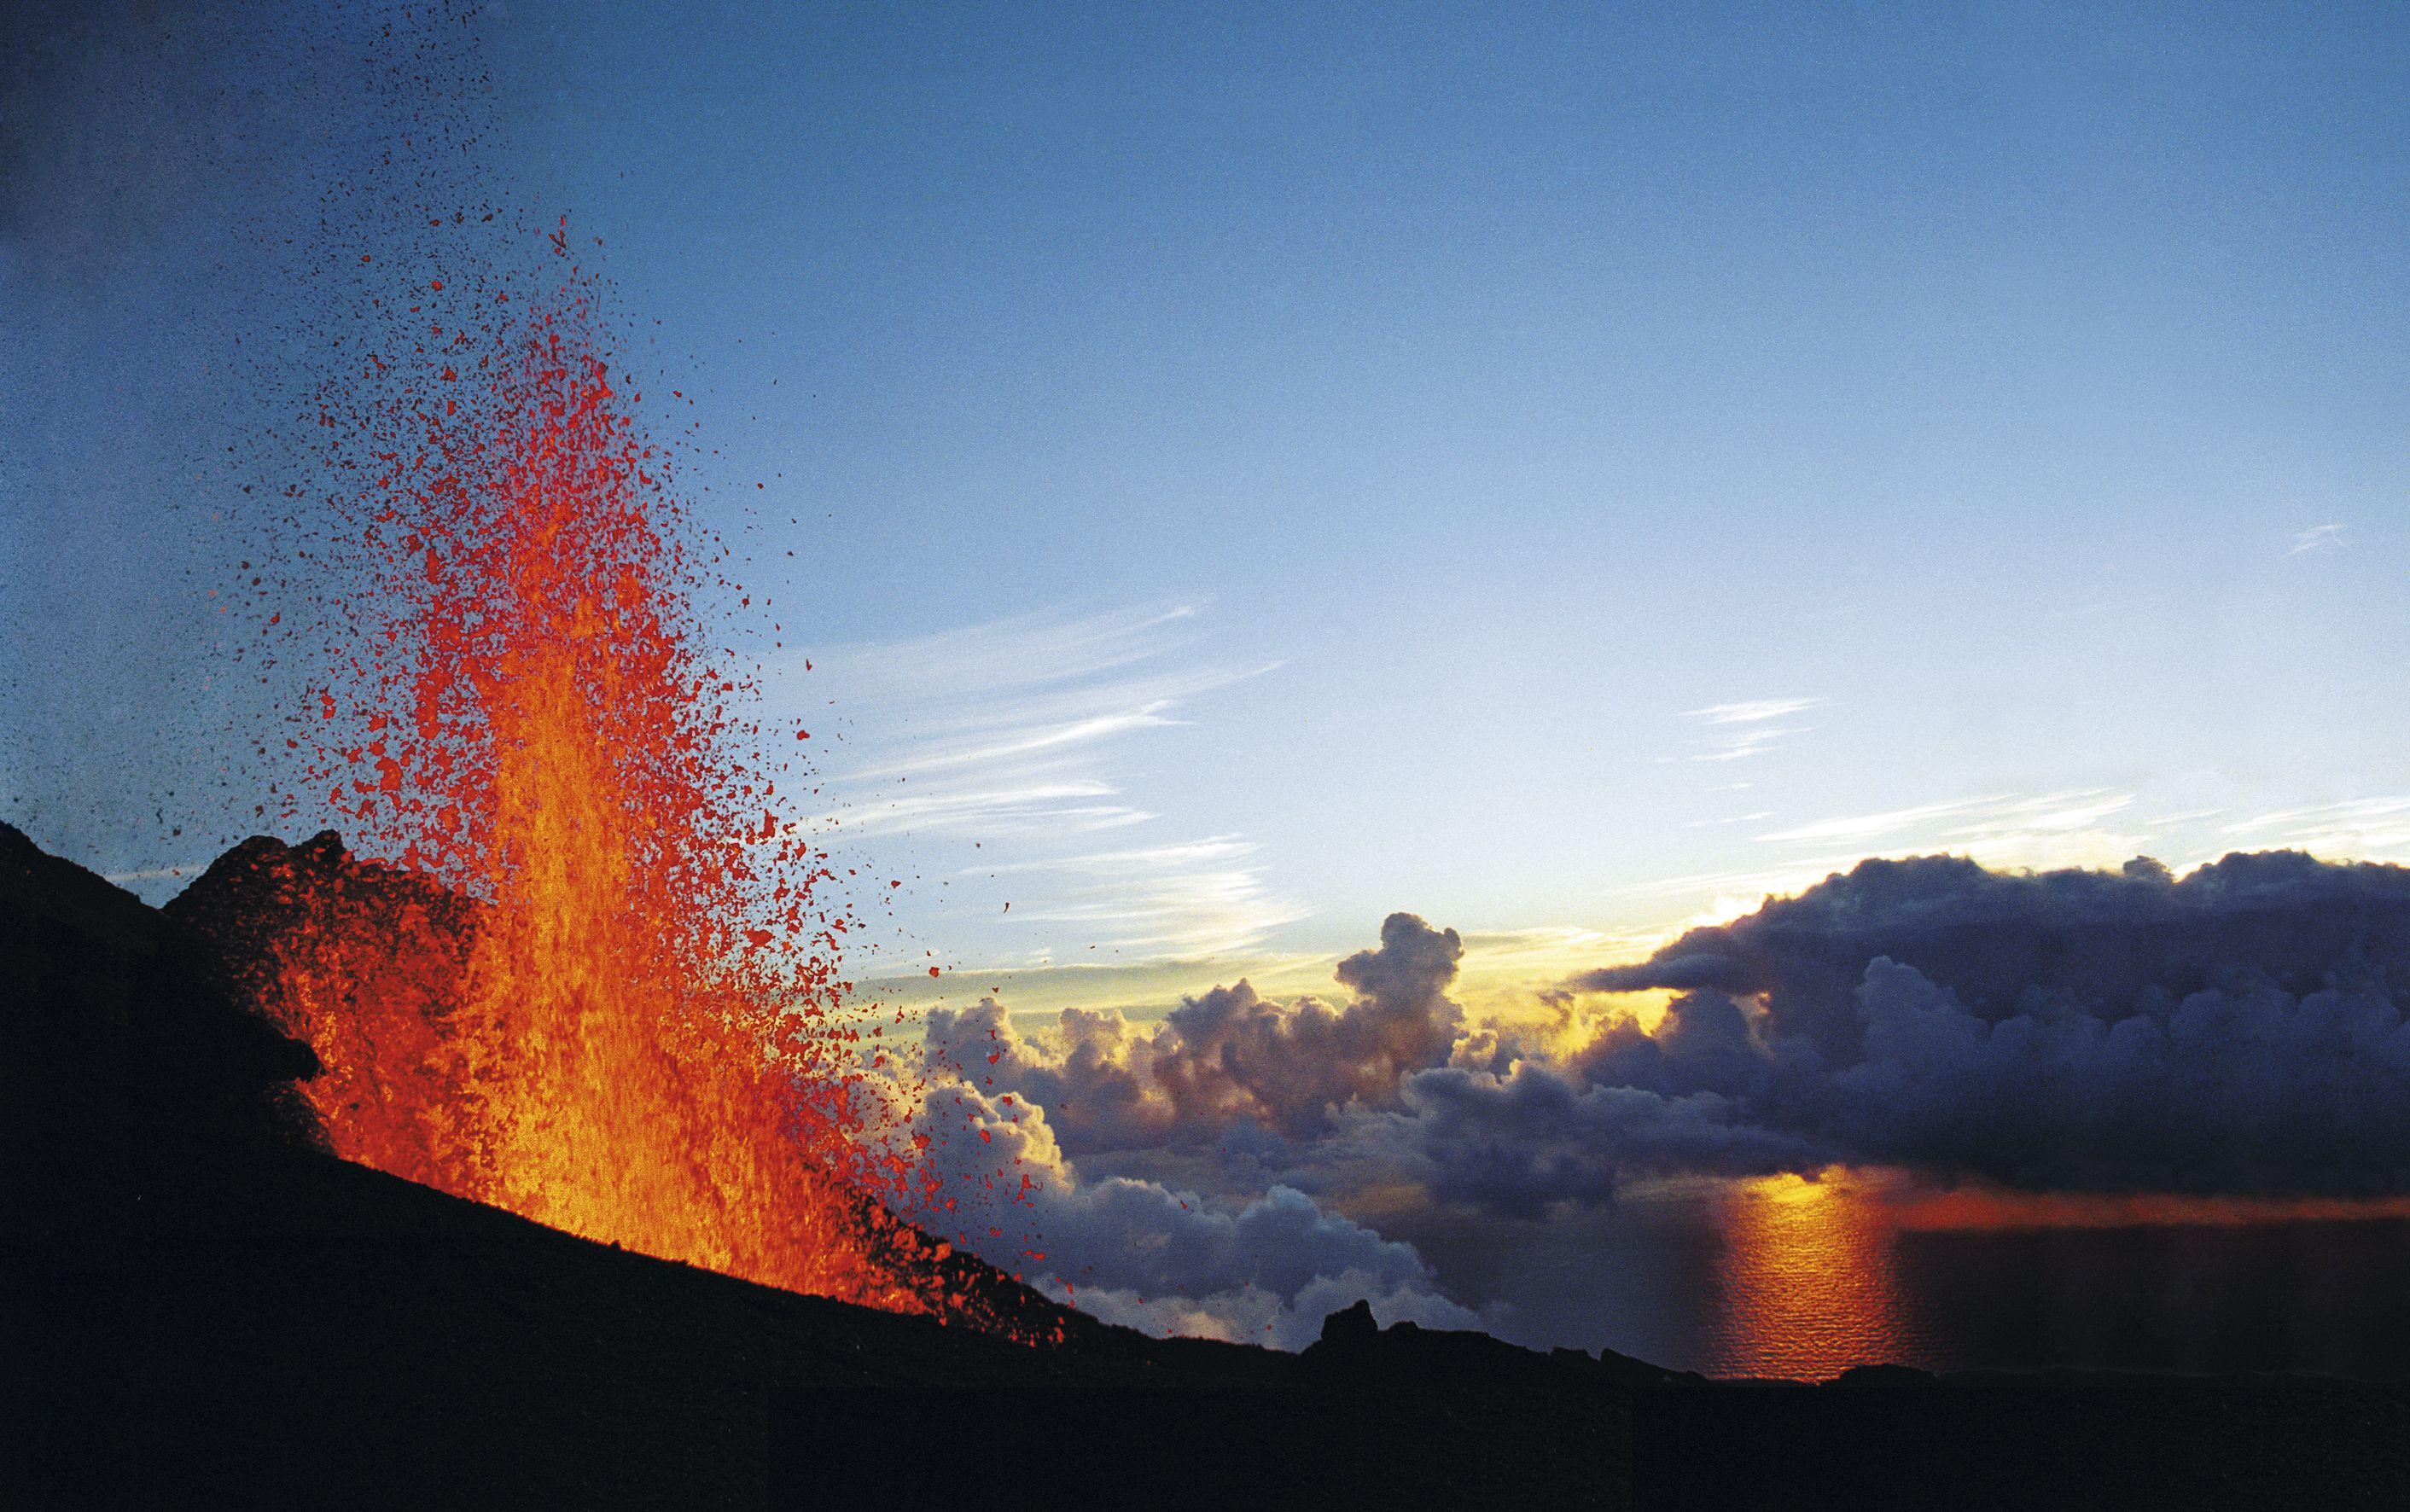 Nice Photo Of An Eruption On La Piton De La Fournaise At Sunset Reunion Island Most Beautiful Beaches Sea Kayaking